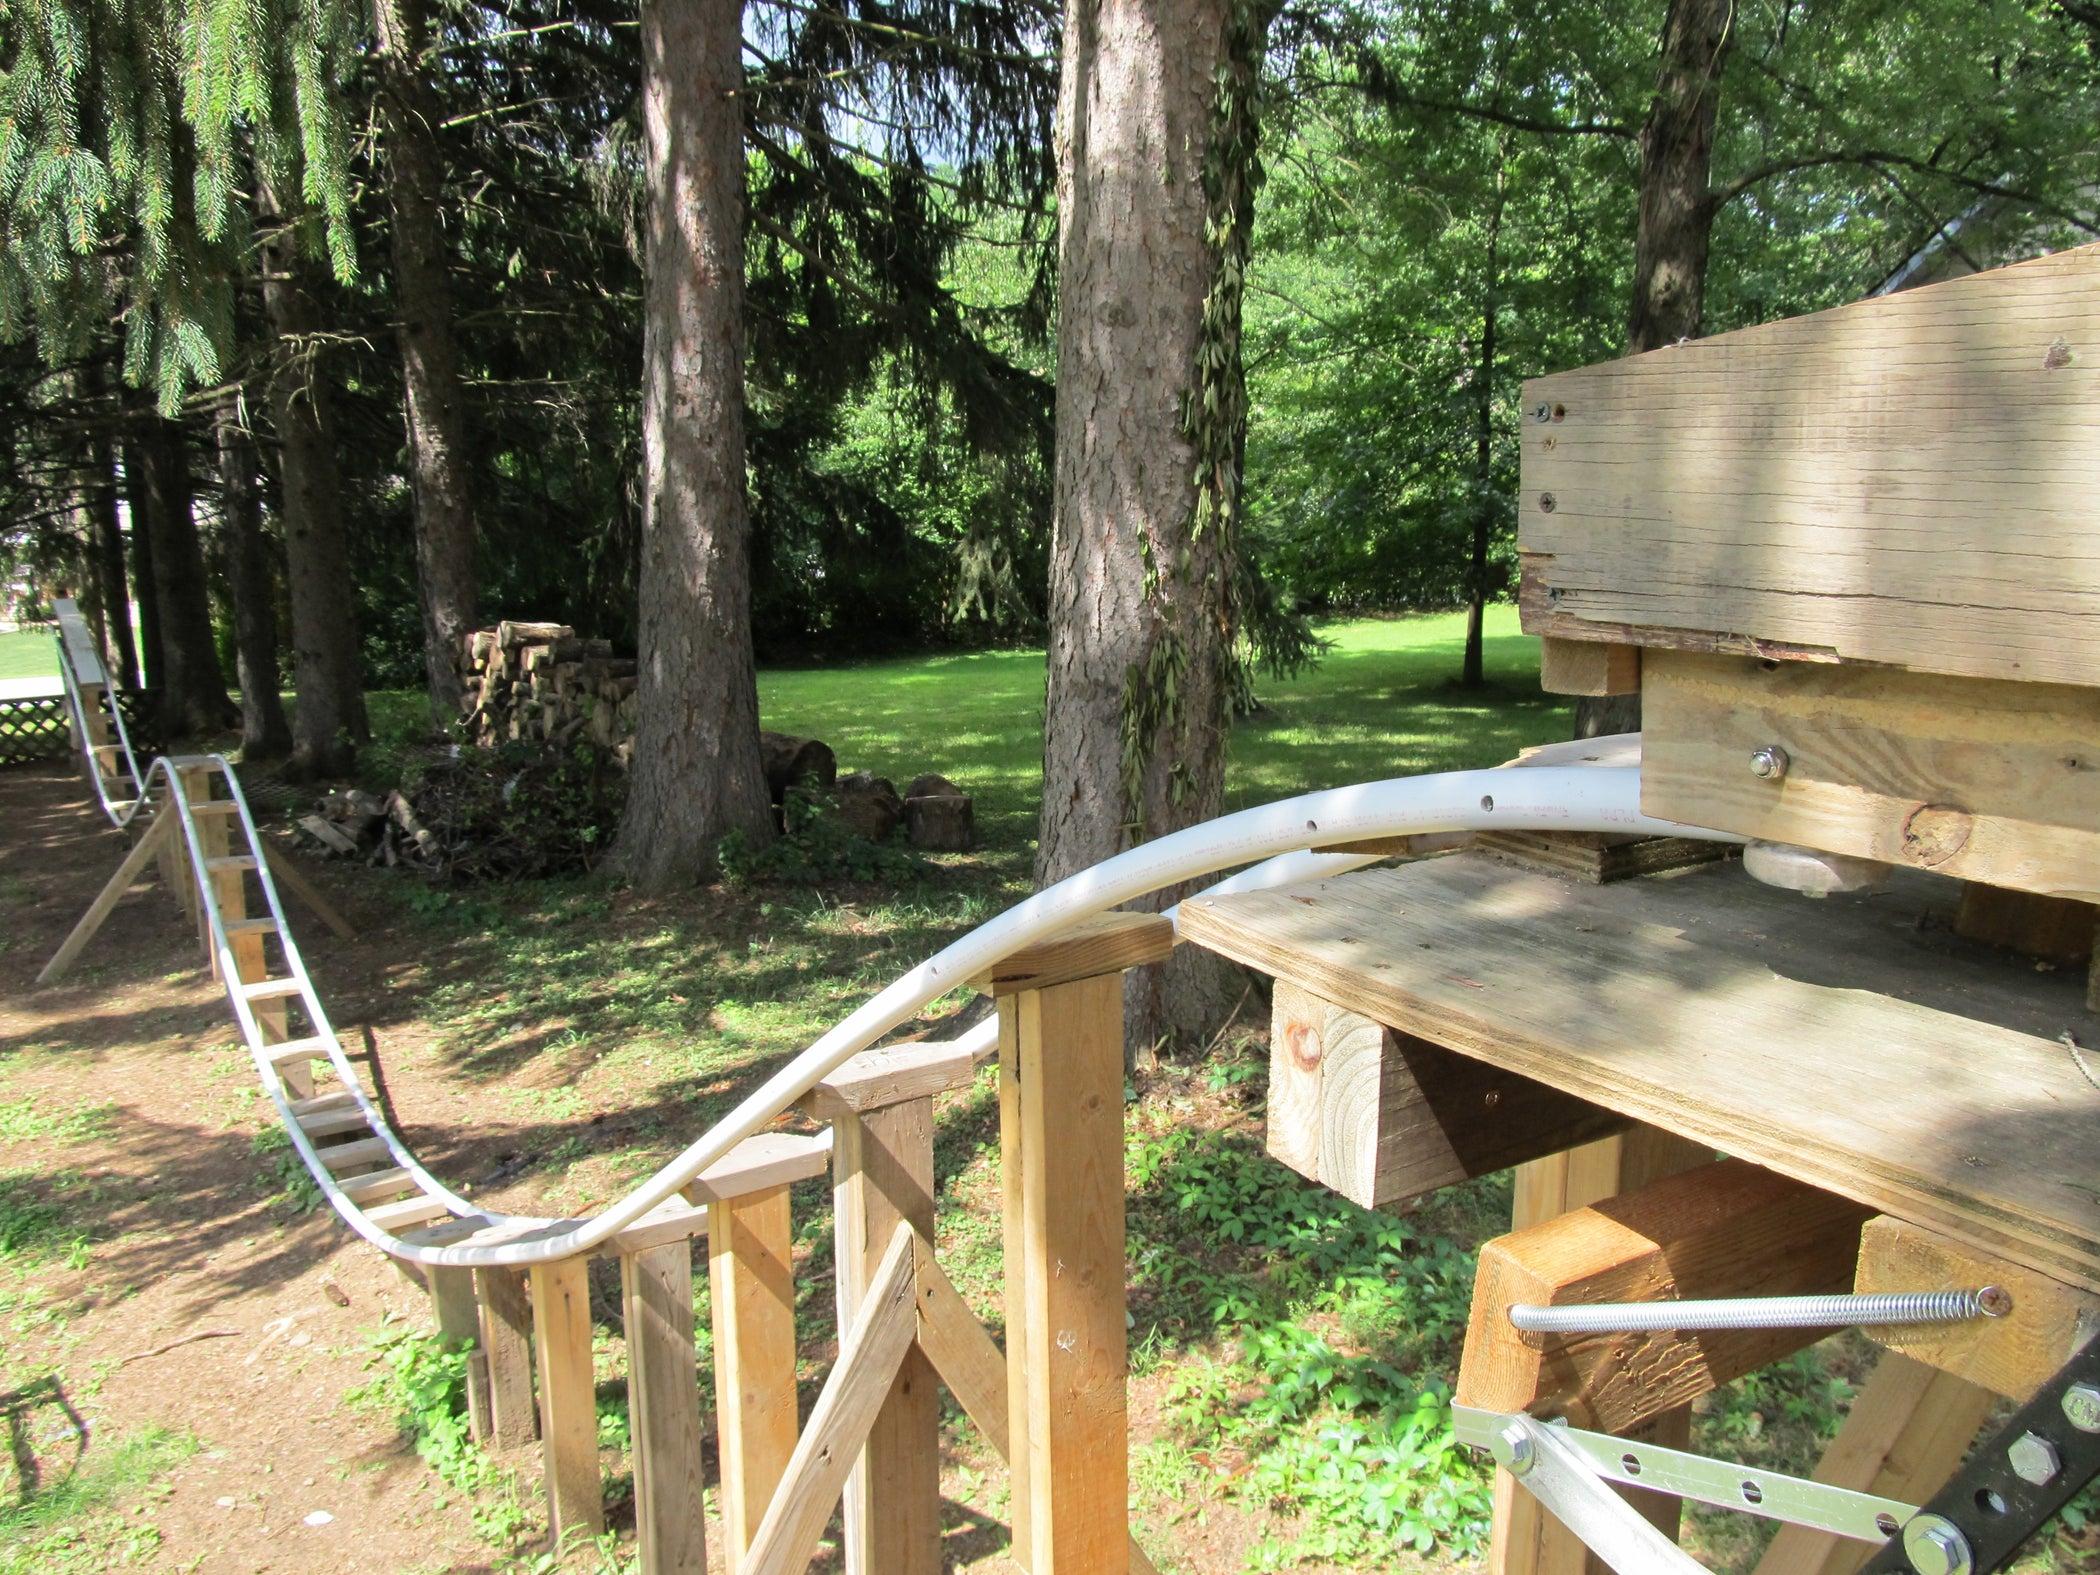 Backyard Roller Coaster - Instructables